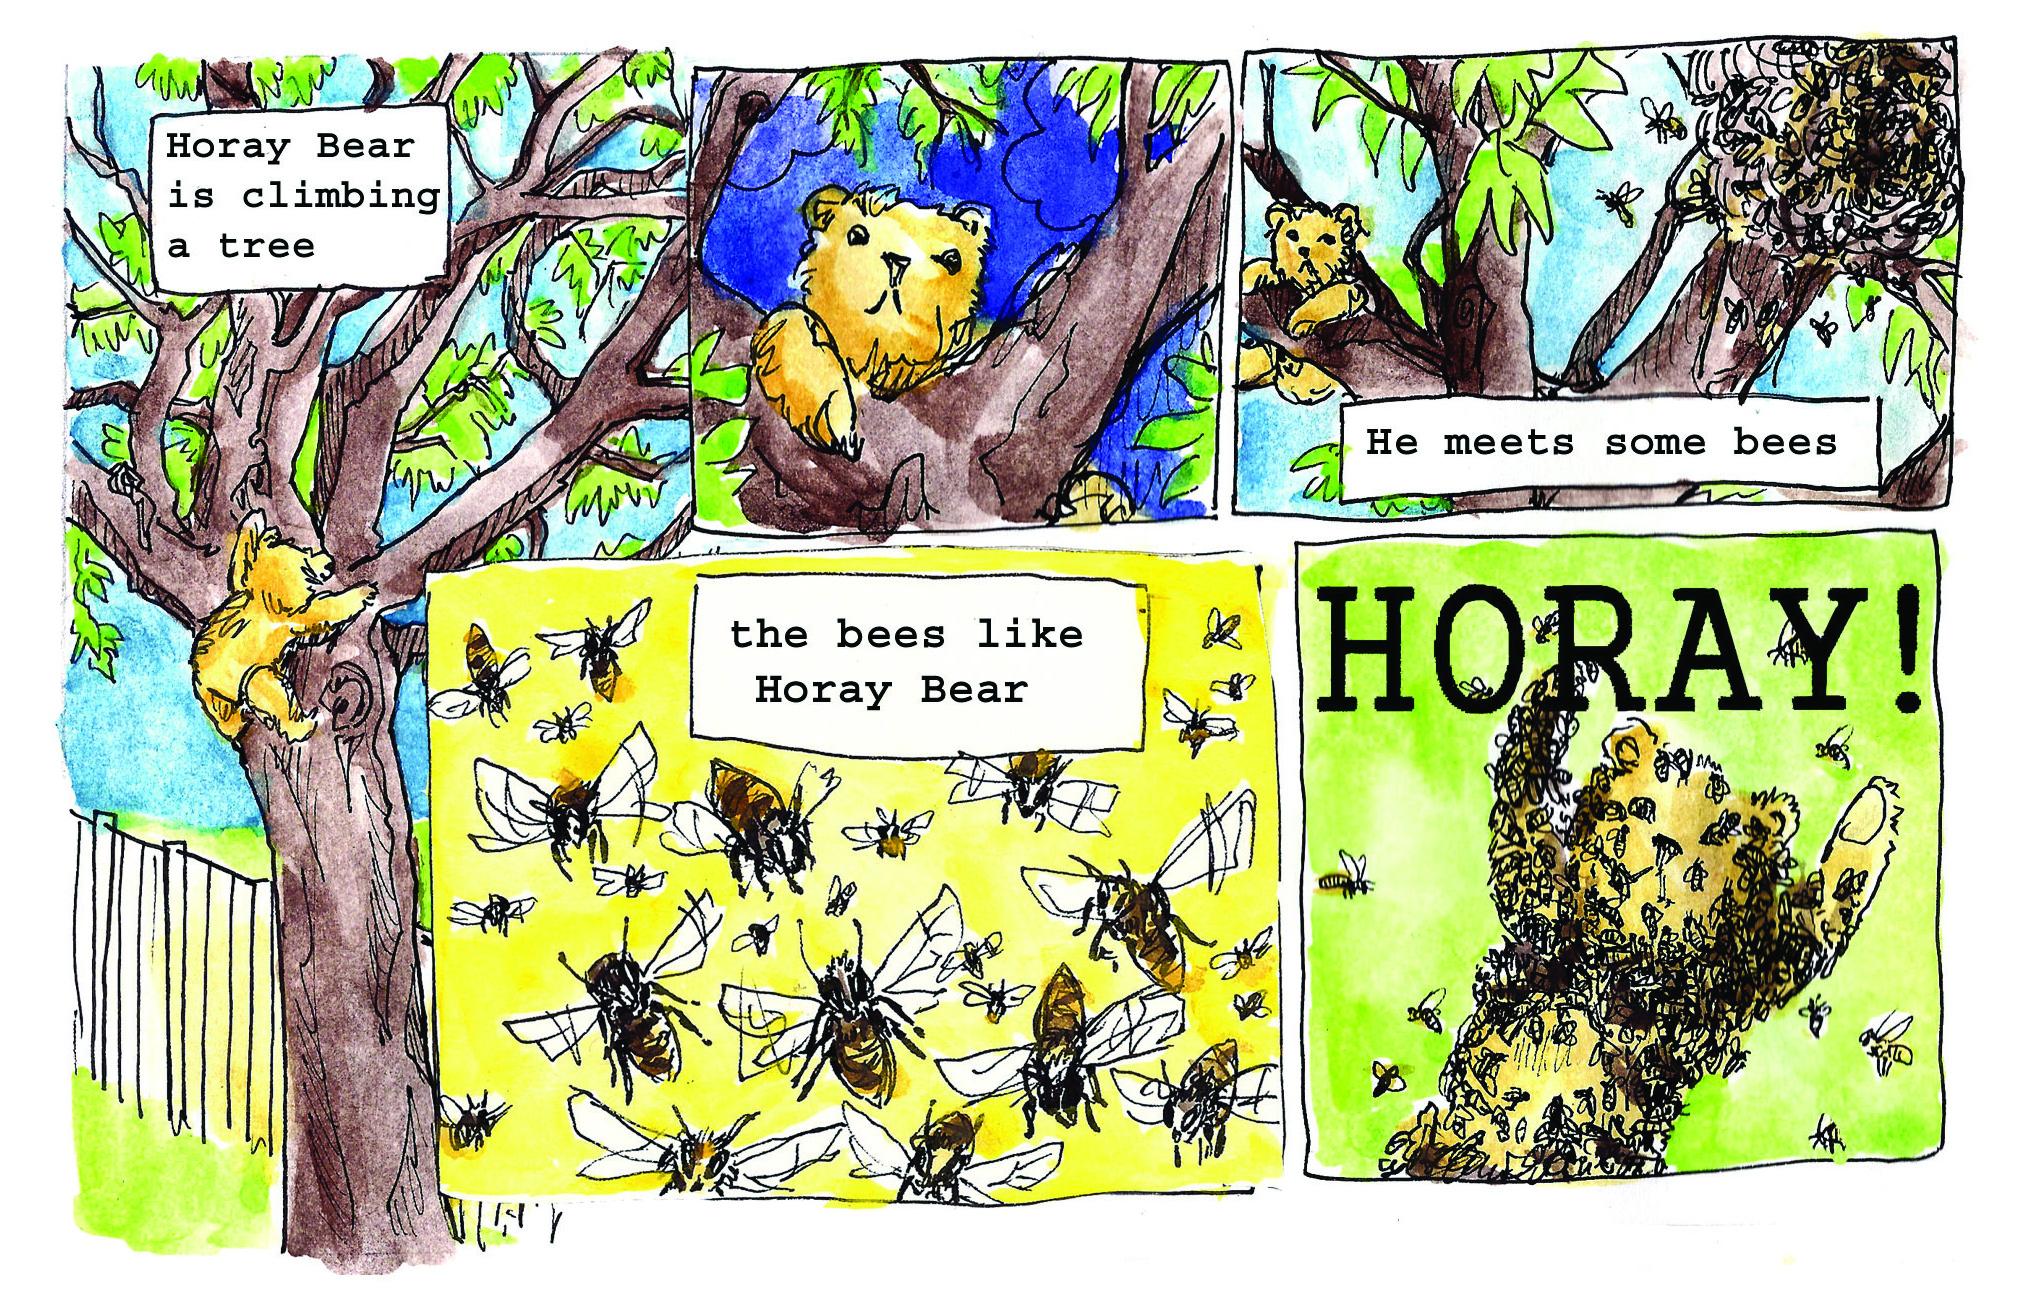 Jenny Robins - Alex George - Sunday Comics page - Horay Bear - bees